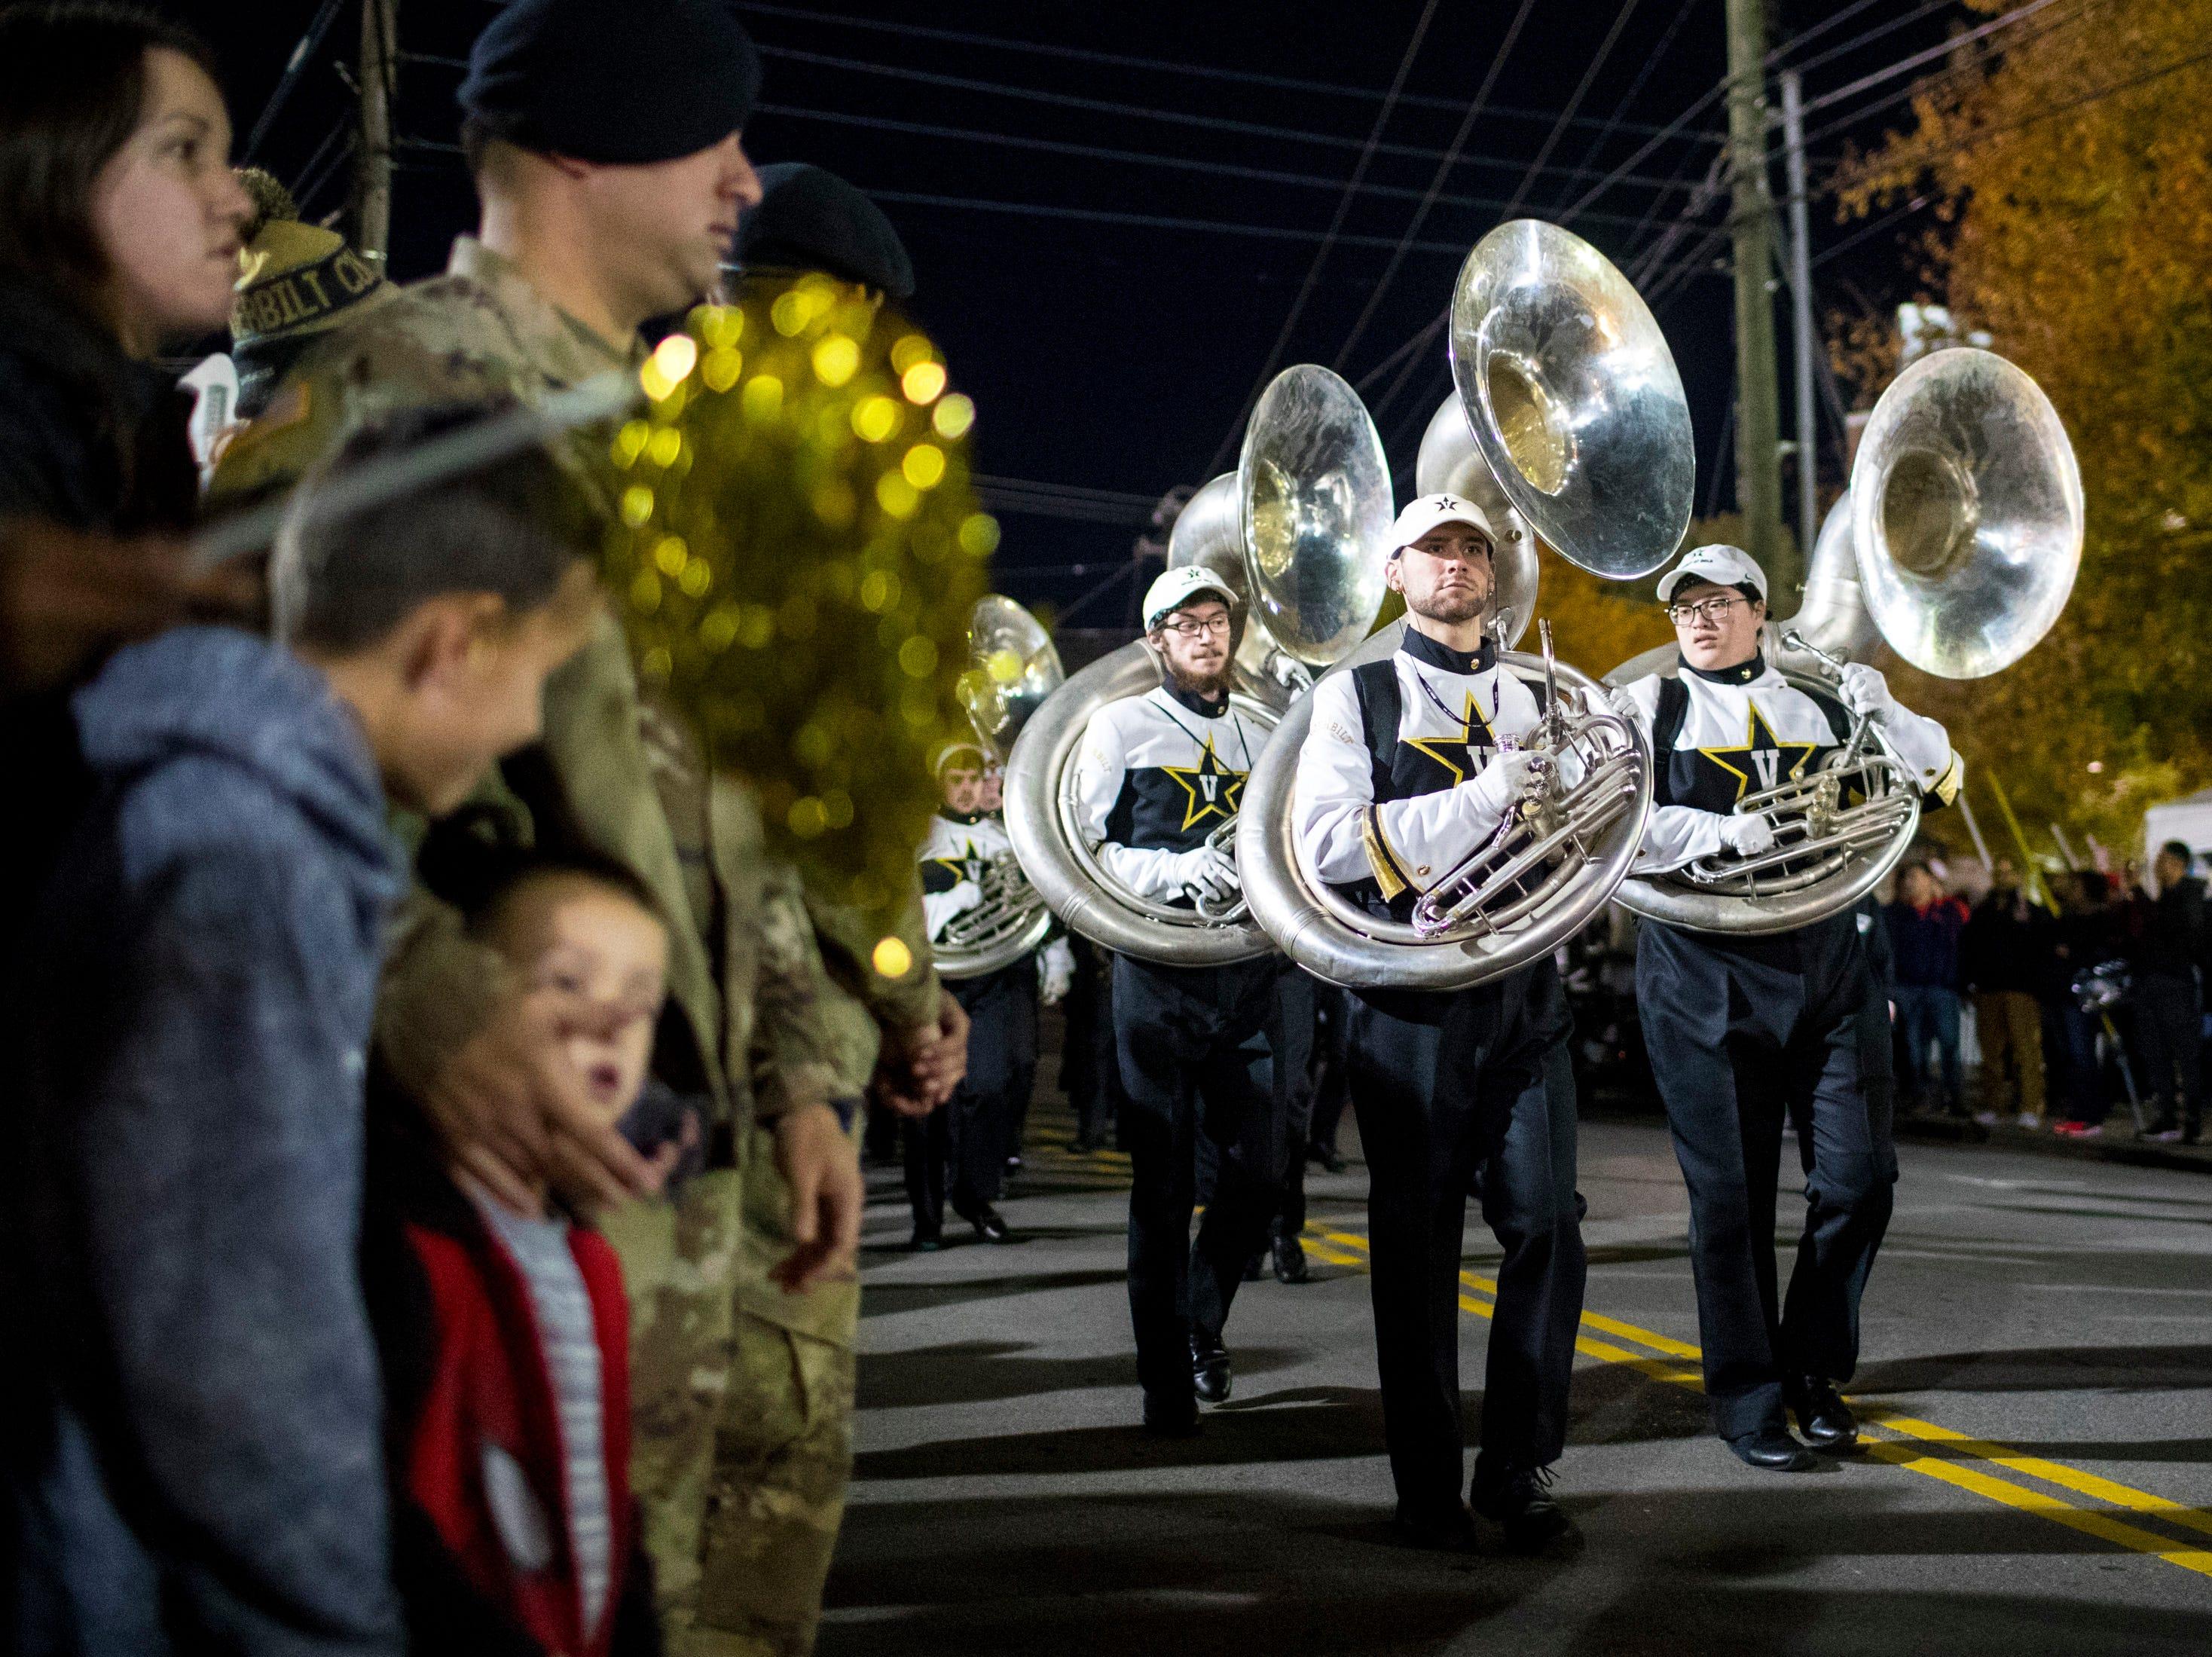 Vanderbilt's band marches to the star walk before Vanderbilt's game against Ole Miss outside of Vanderbilt Stadium in Nashville on Saturday, Nov. 17, 2018.